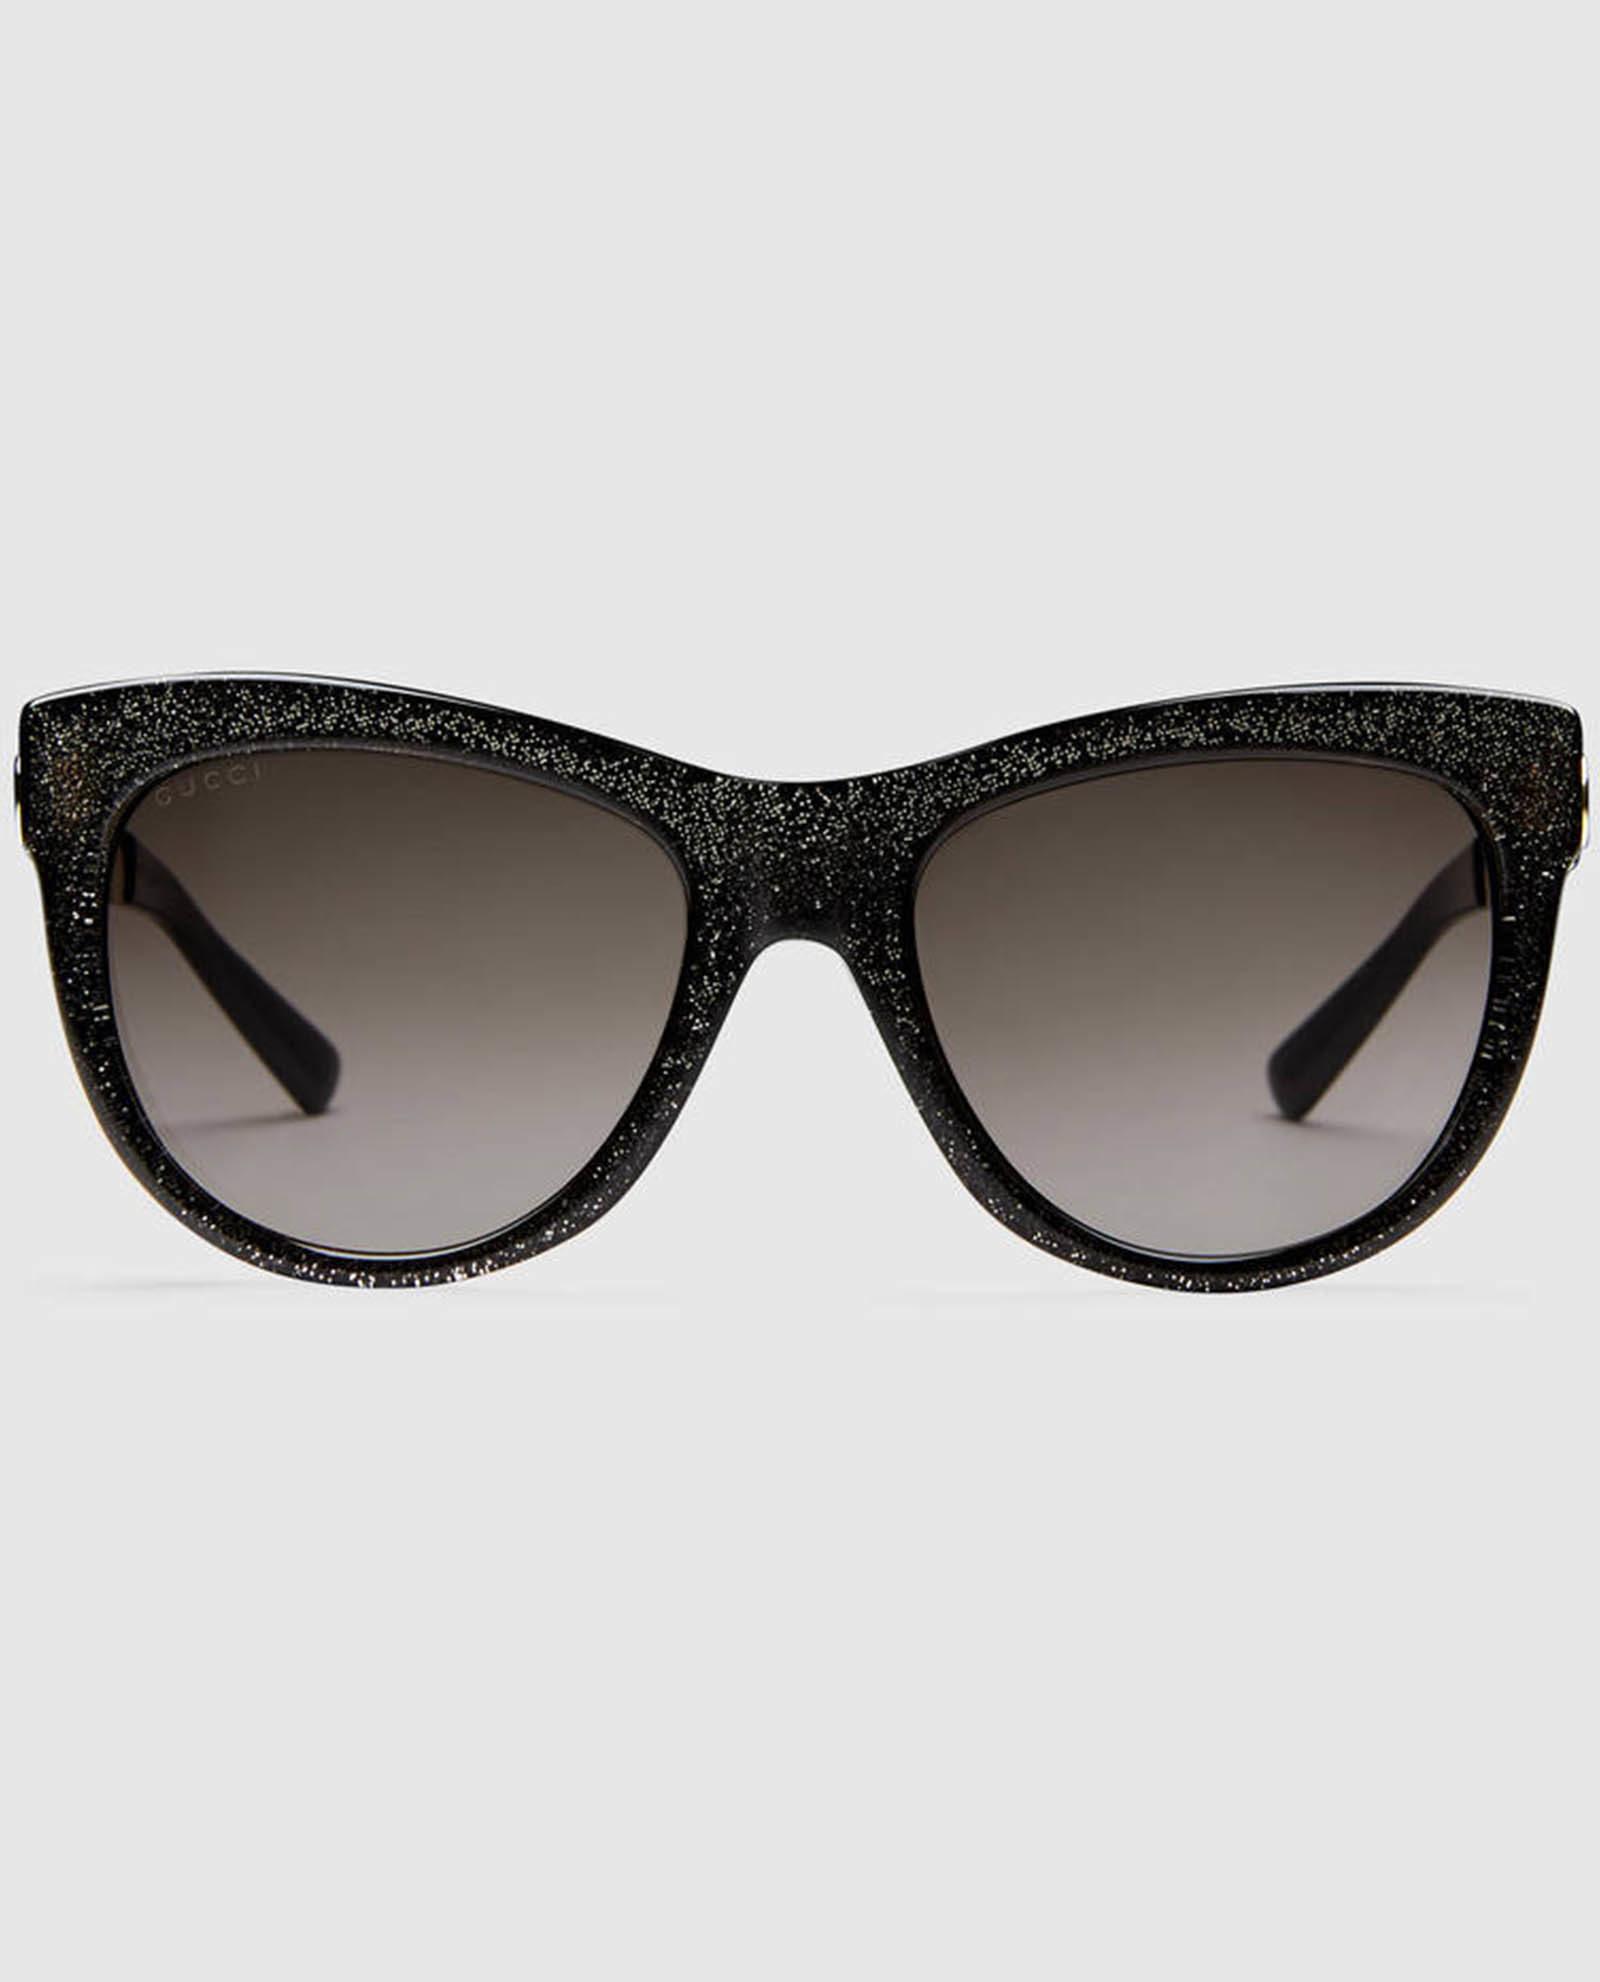 434045_J1350_8582_001_100_0000_Light-Cat-eye-glitter-sunglasses-GUCCI-WOMAN